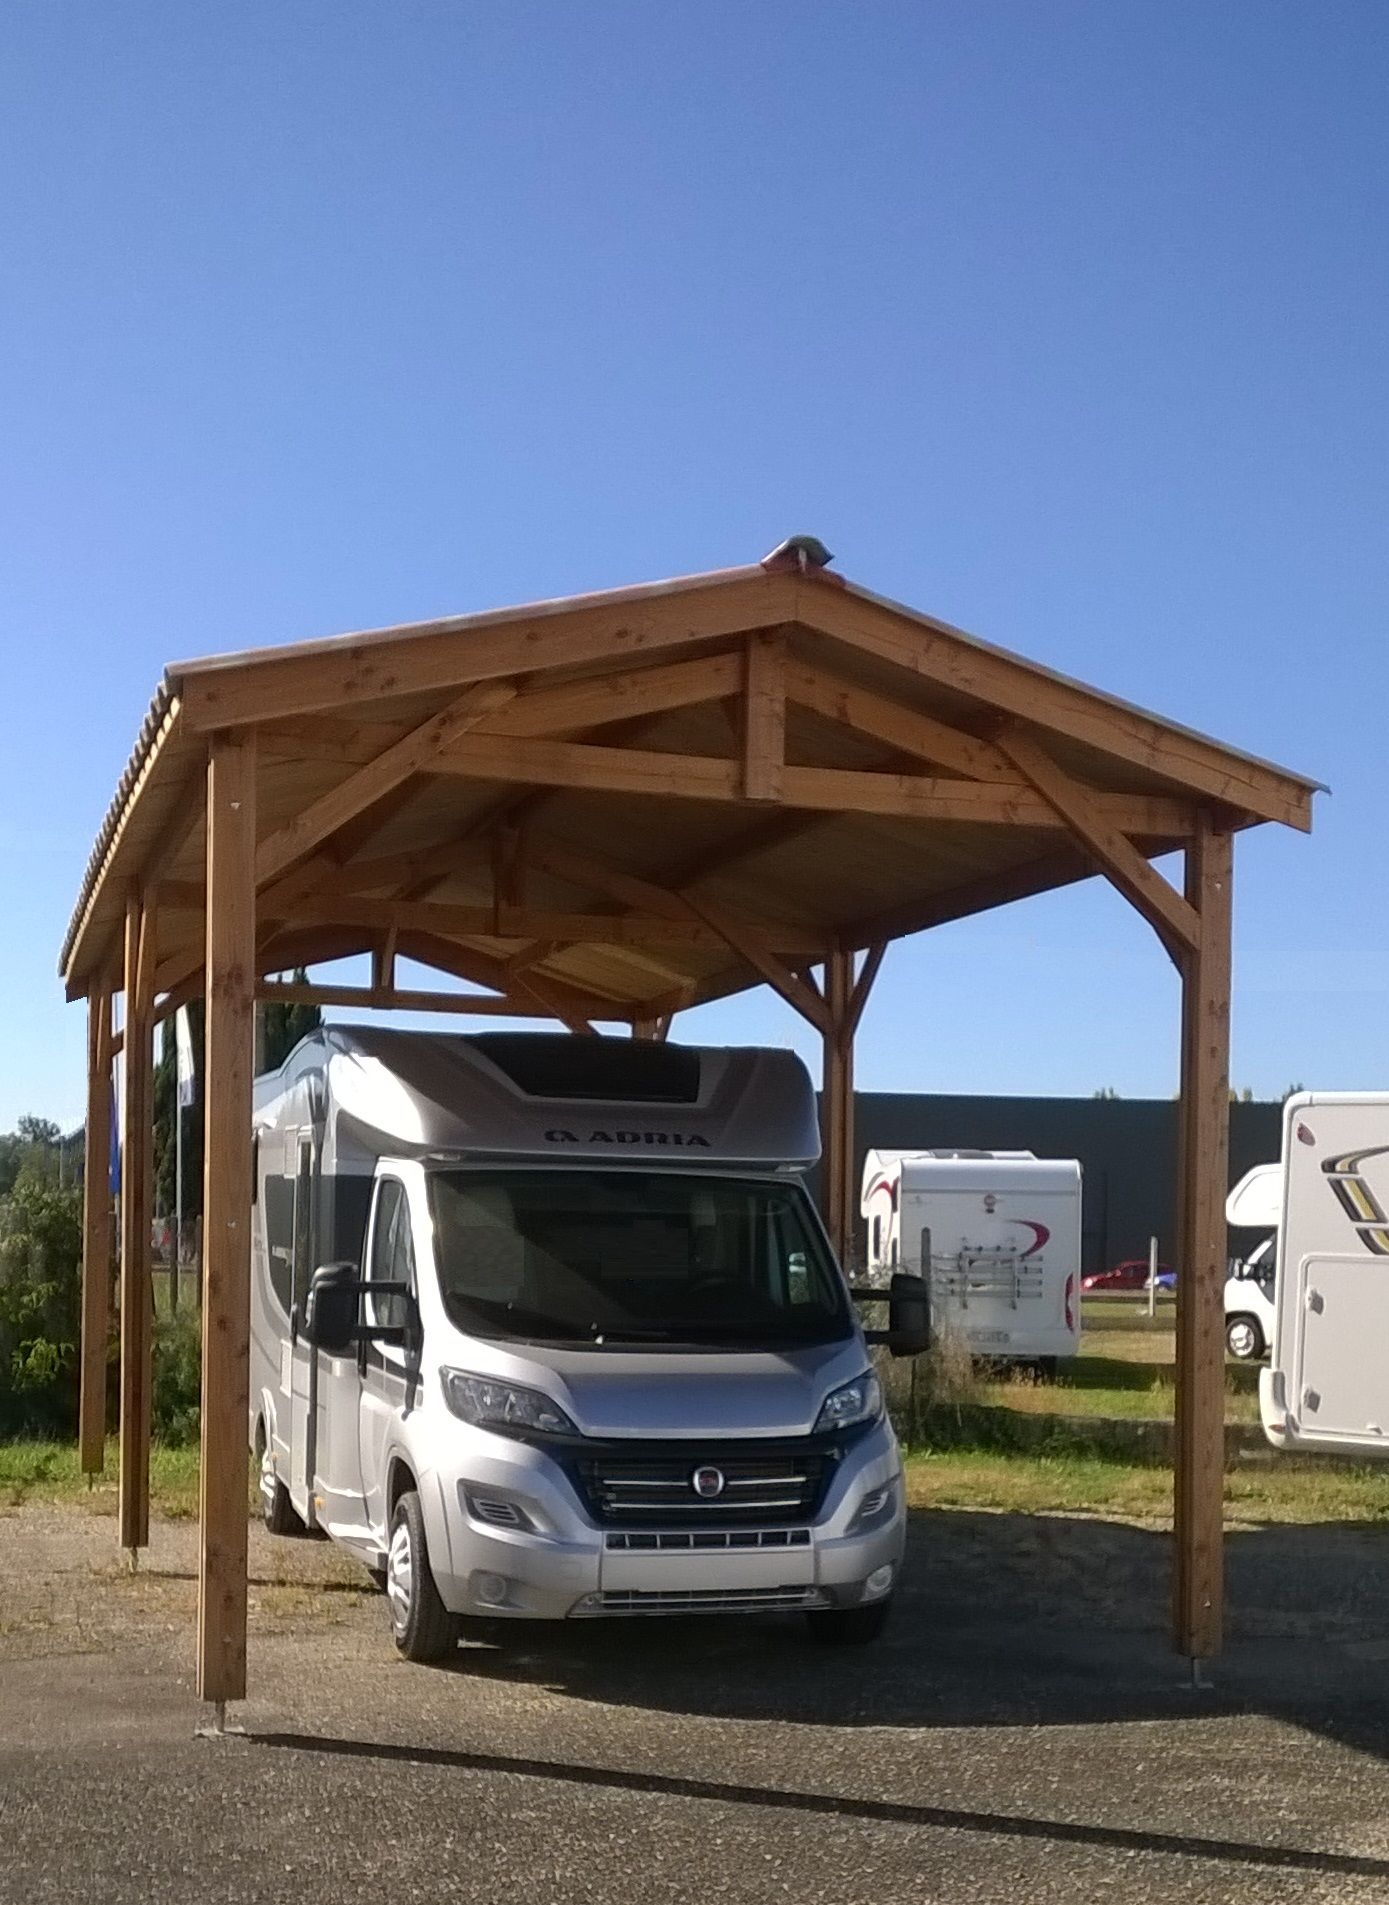 Épinglé sur Carport Campingcar